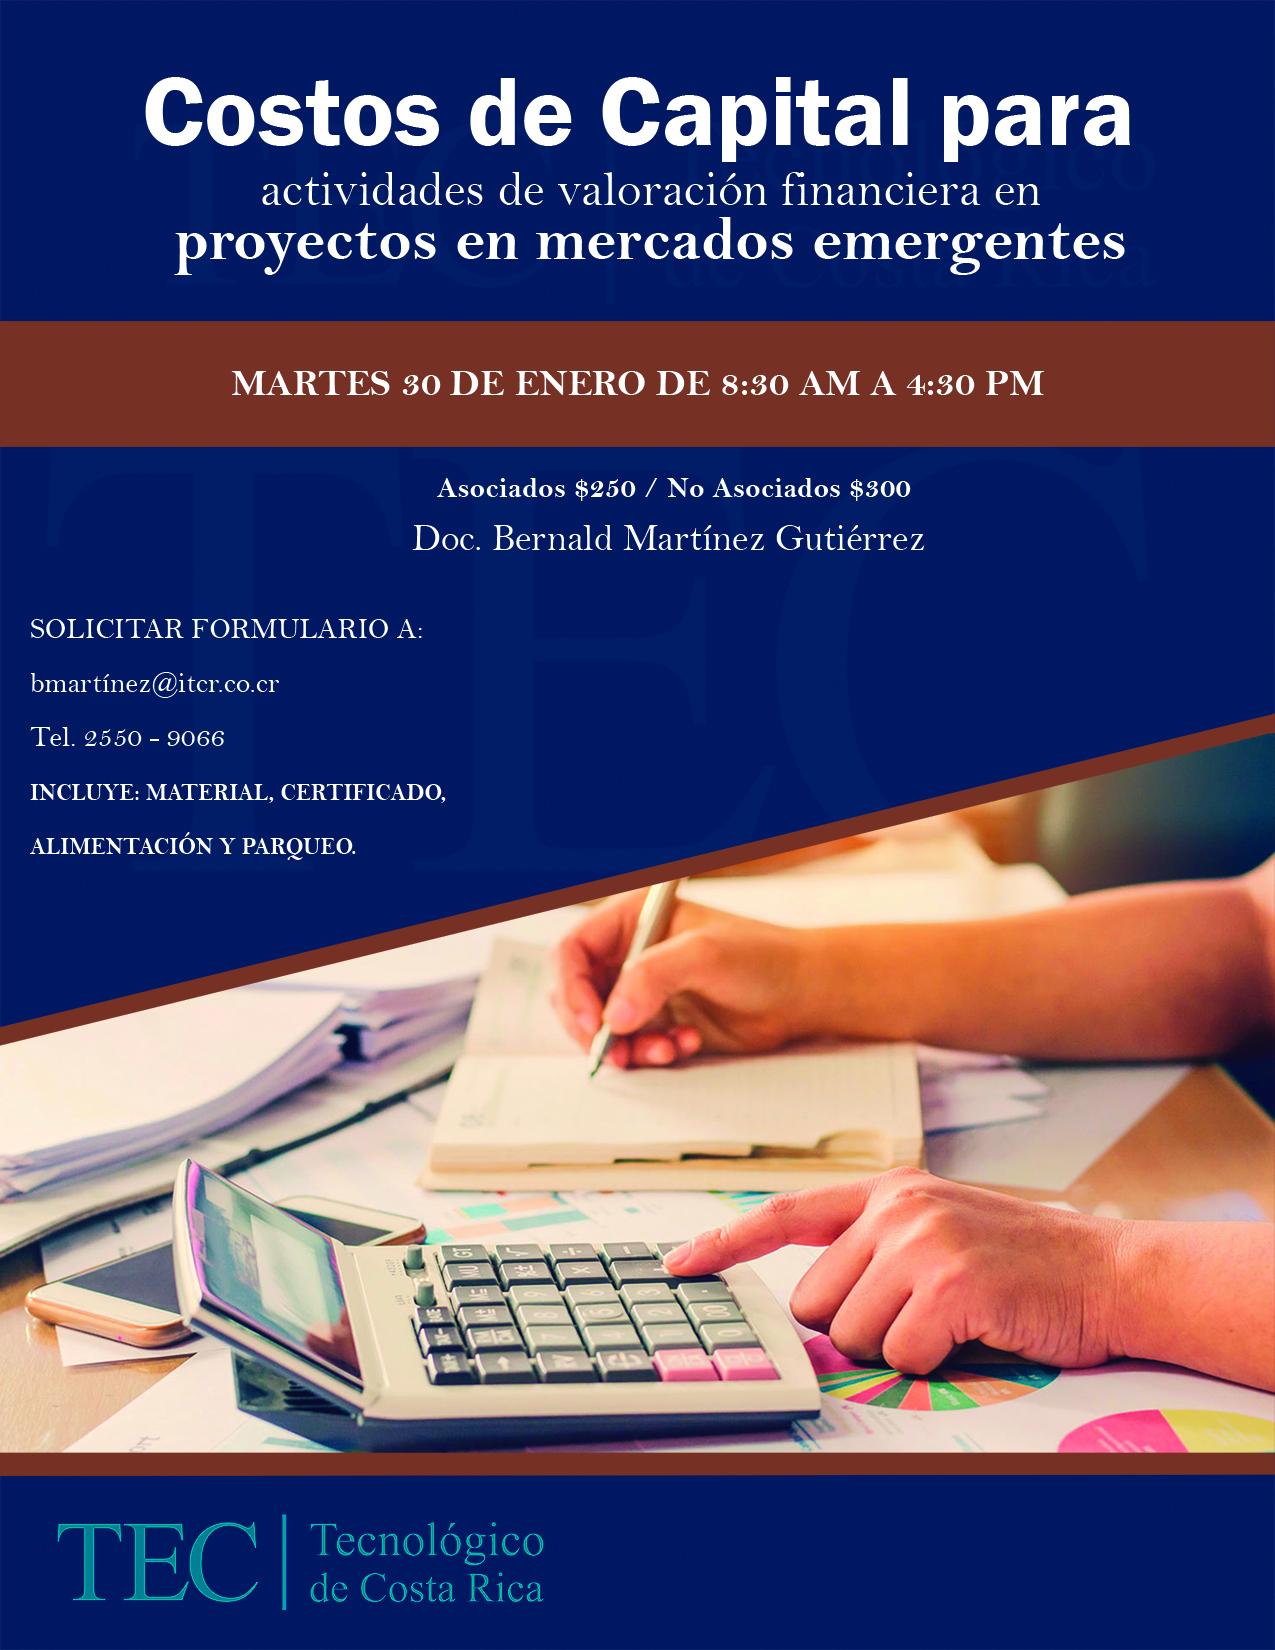 Costo Capital Training Course - ProProfs